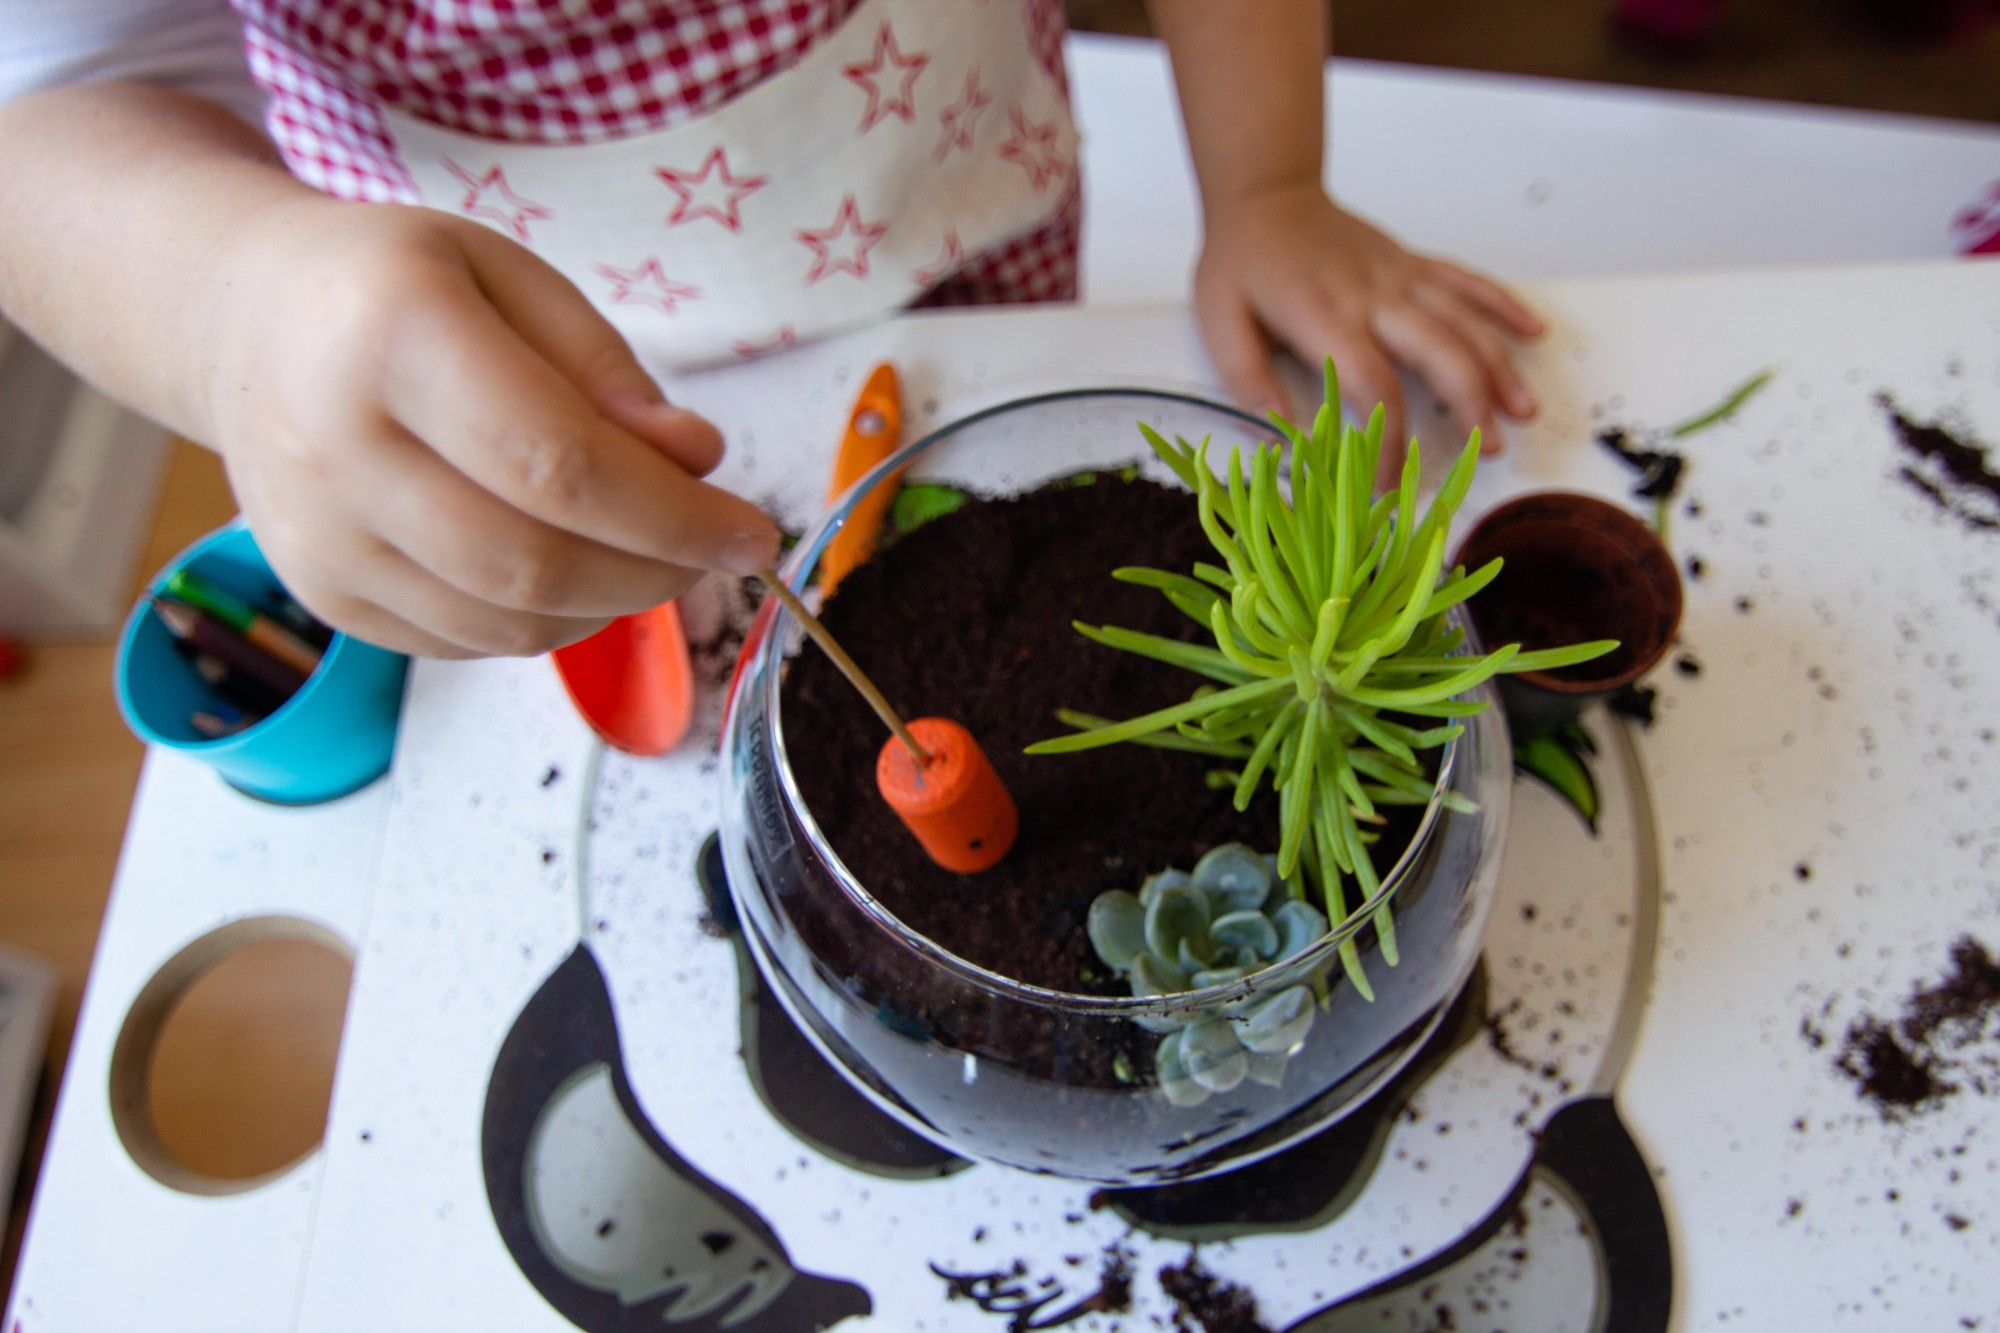 Child building a mini garden in a glass bowl